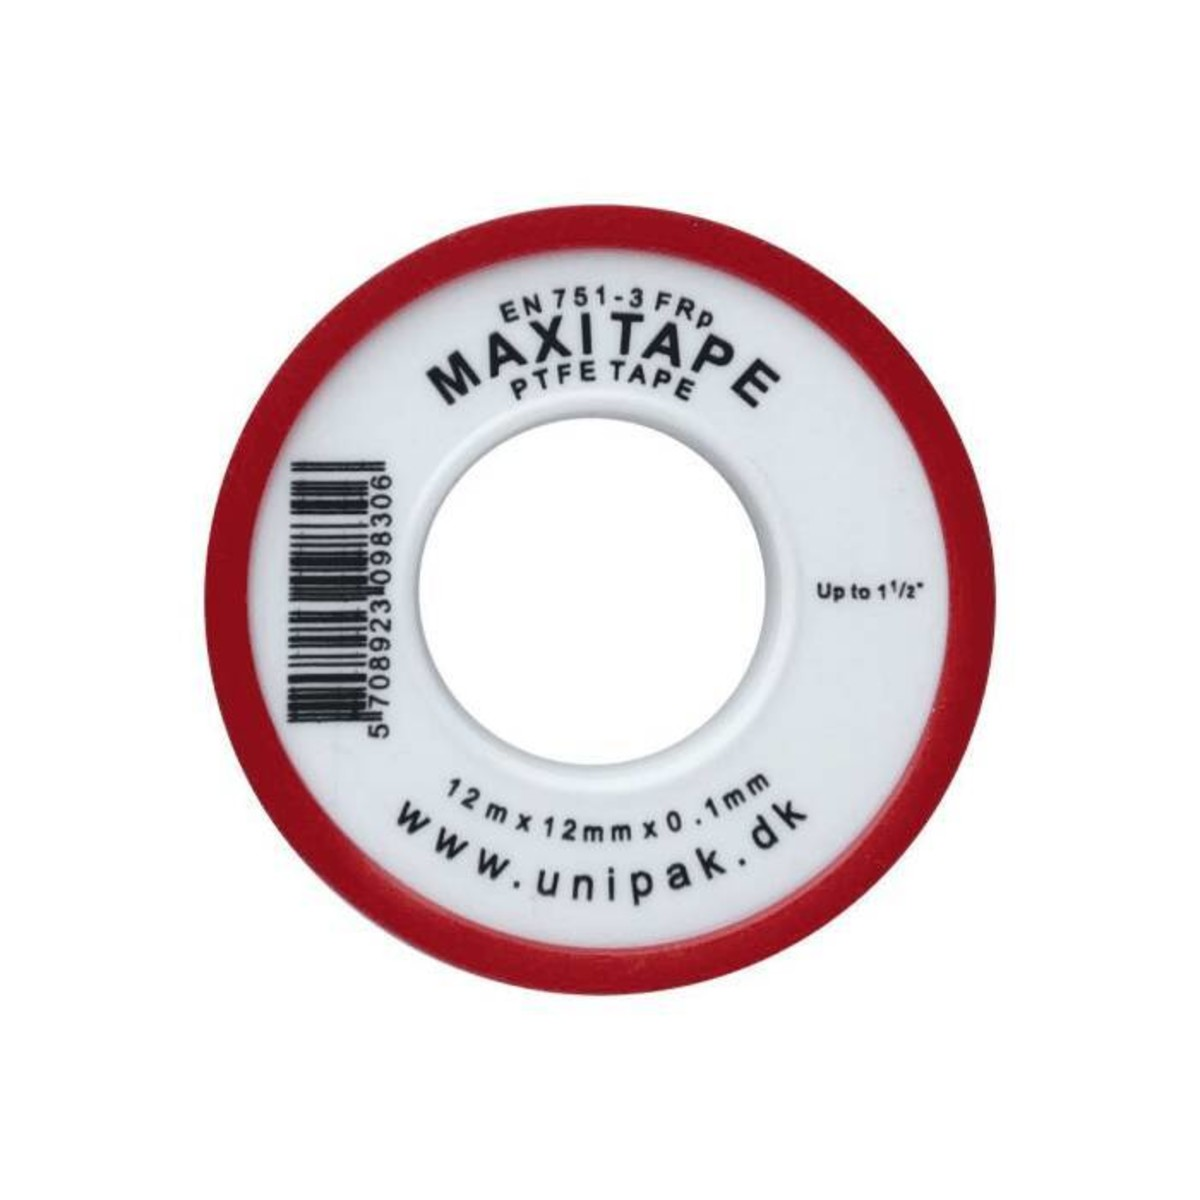 Лента-фум Unipak Maxitape MD 12х0.1 мм 13.2 м